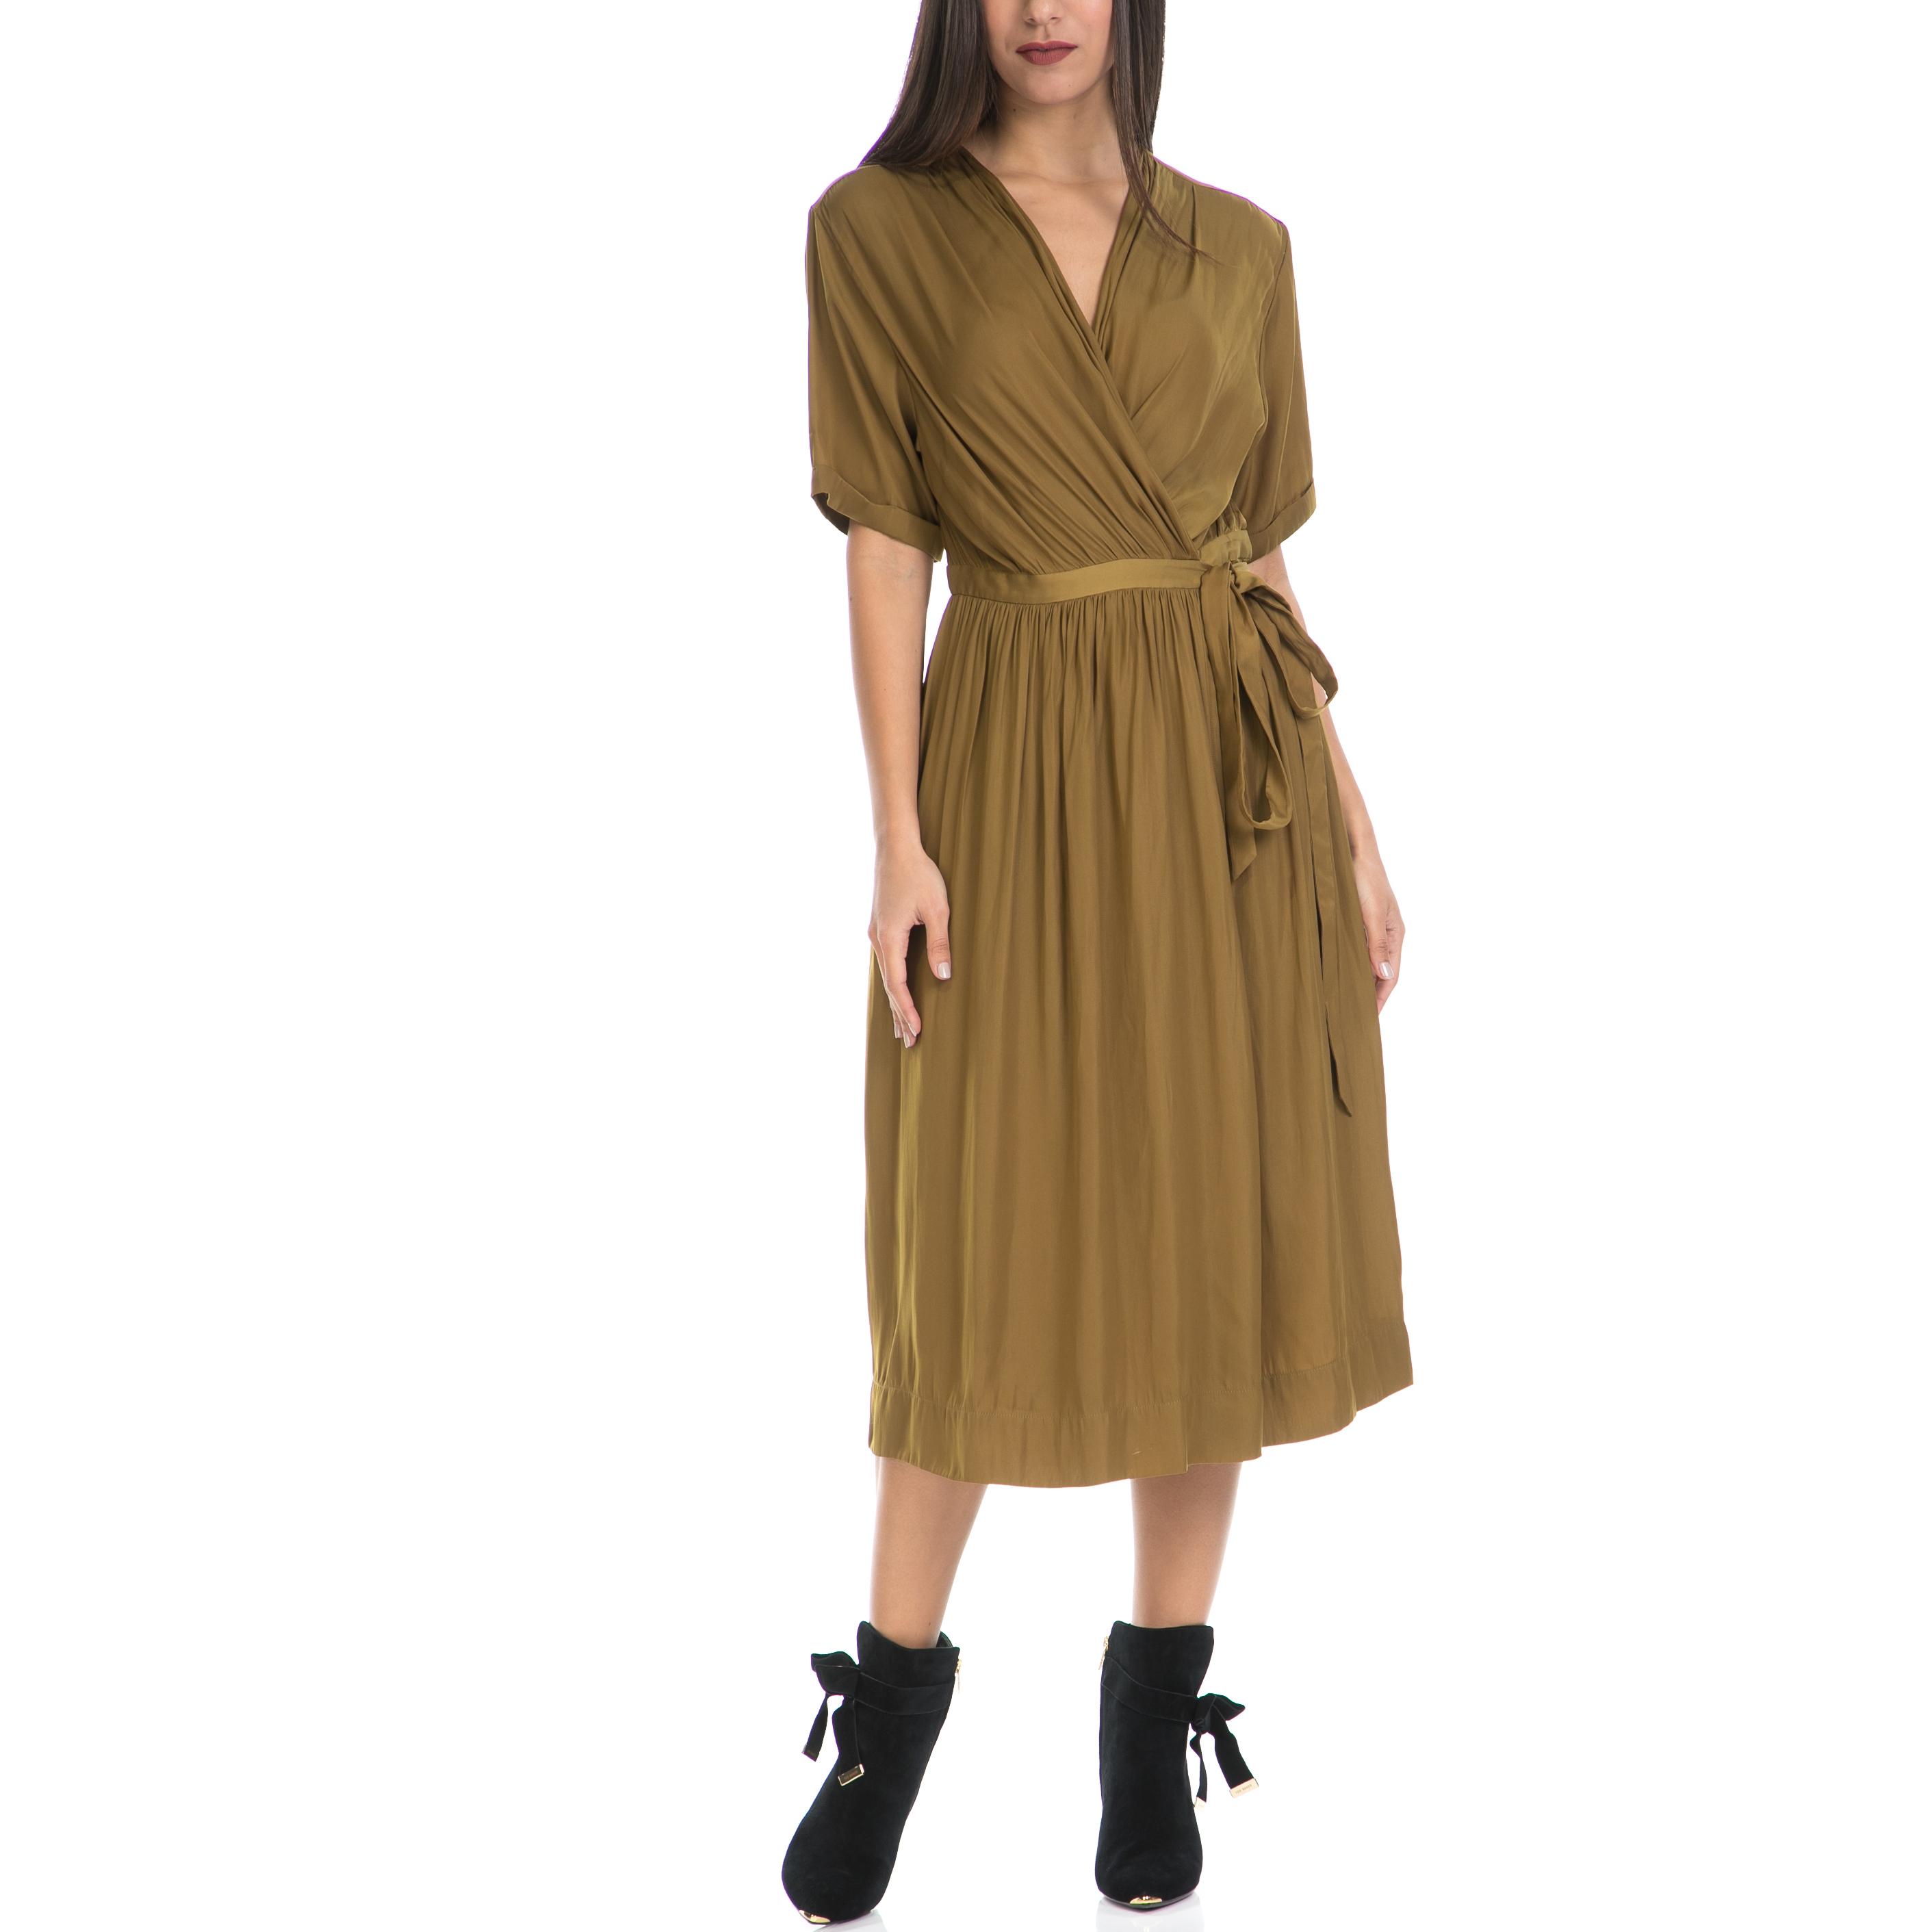 MAISON SCOTCH - Γυναικείο φόρεμα MAISON SCOTCH χακί γυναικεία ρούχα φορέματα μάξι